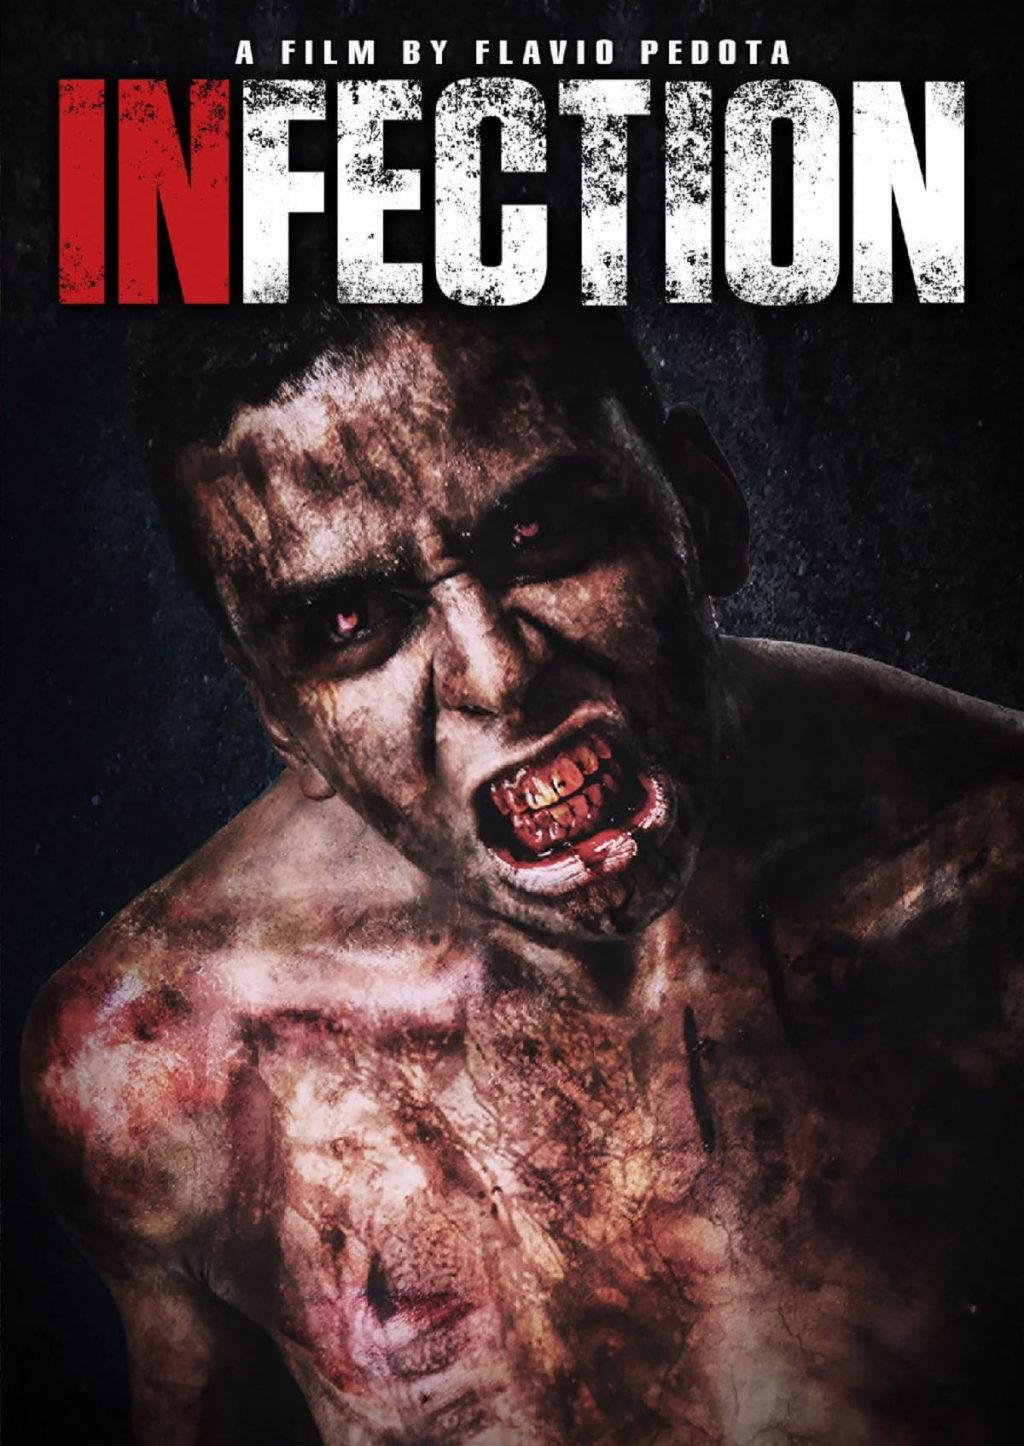 INFECTION: Trailer For New Venezuelan Zombie Film